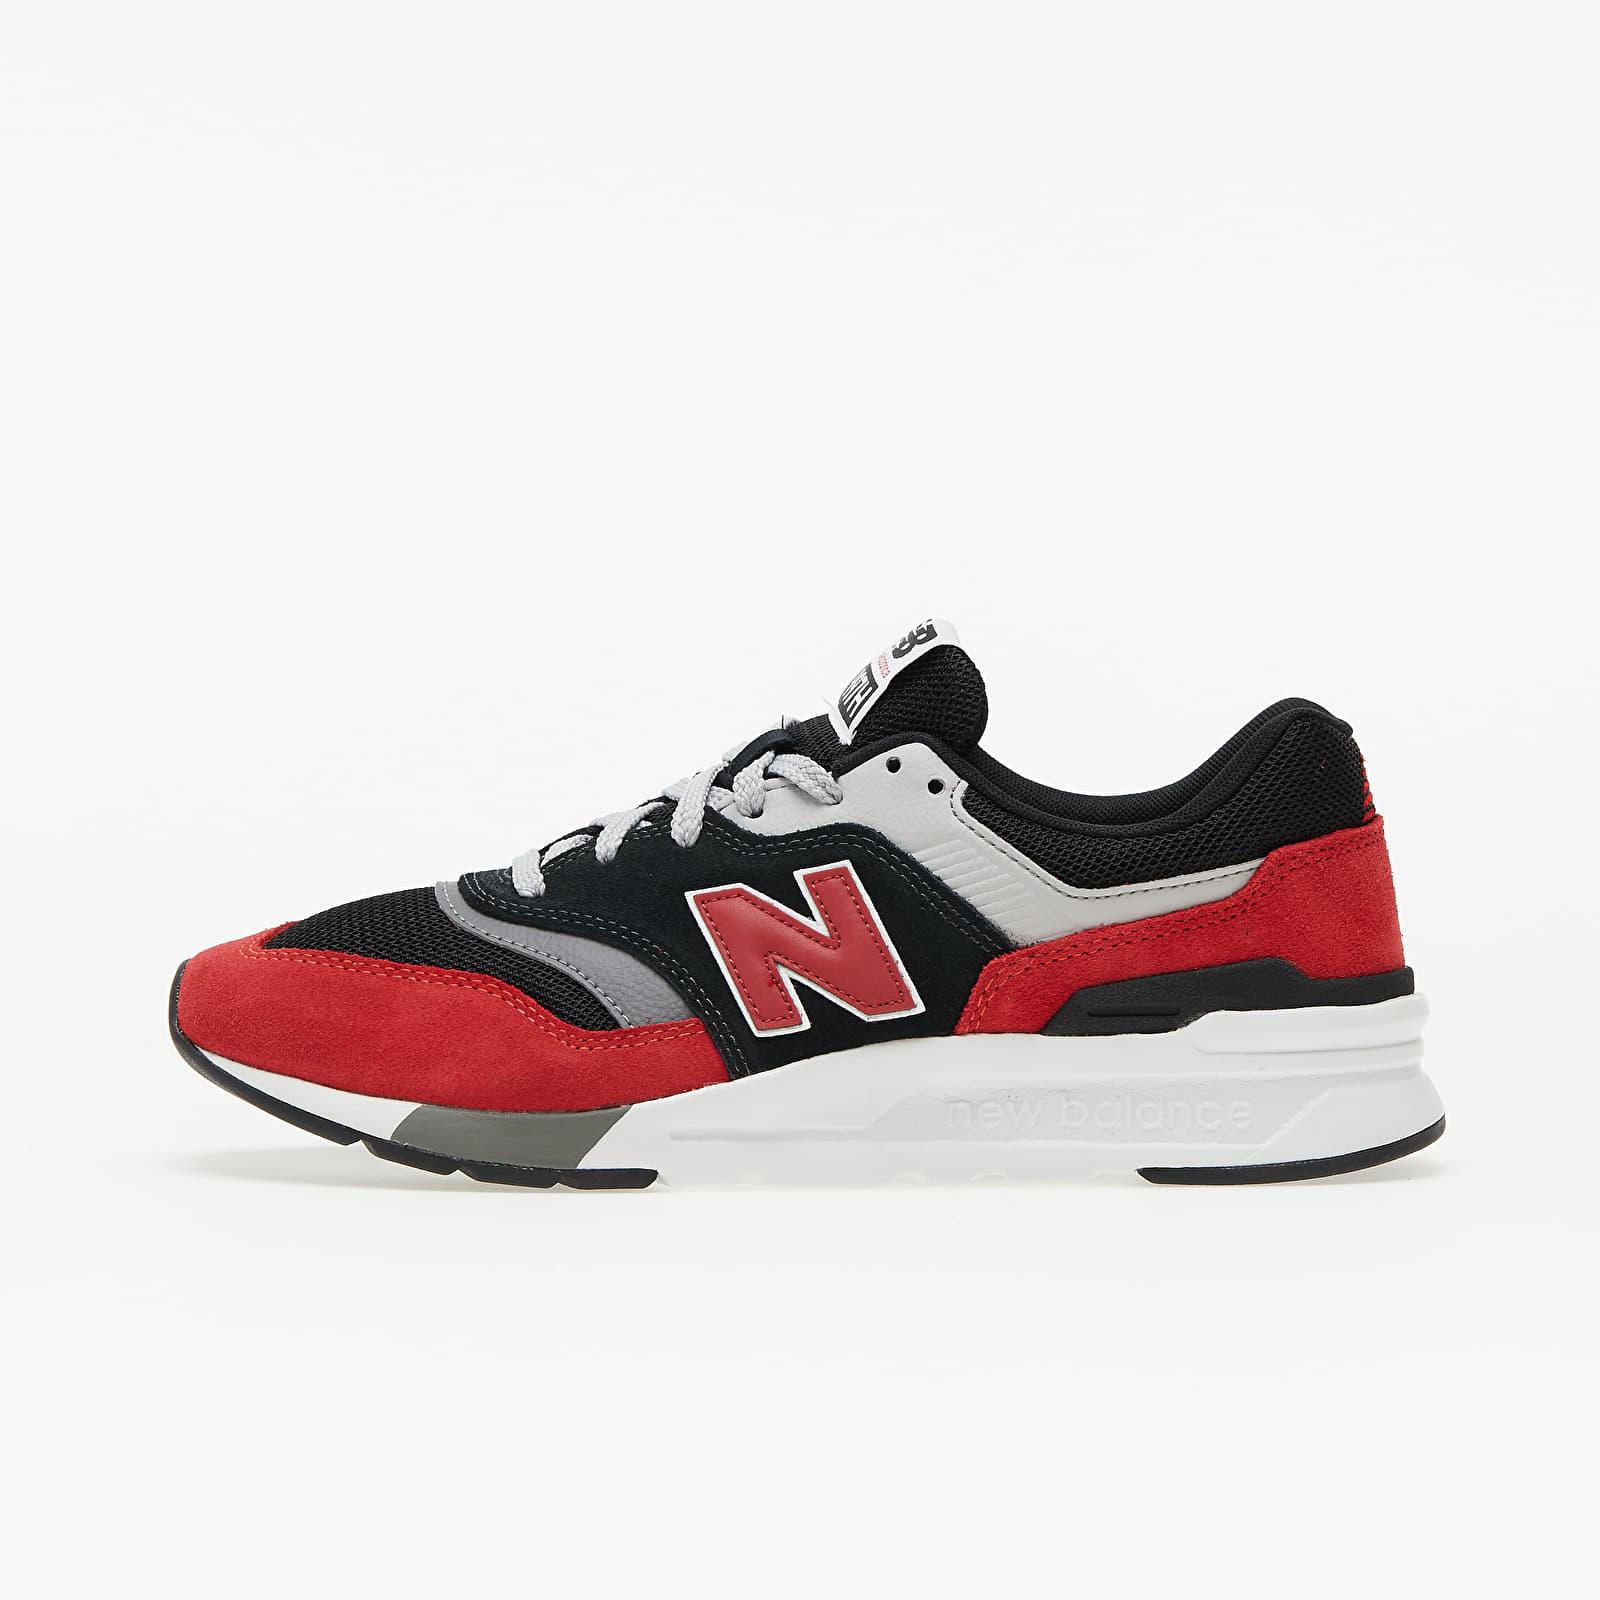 New Balance 997 Black/ Red EUR 42